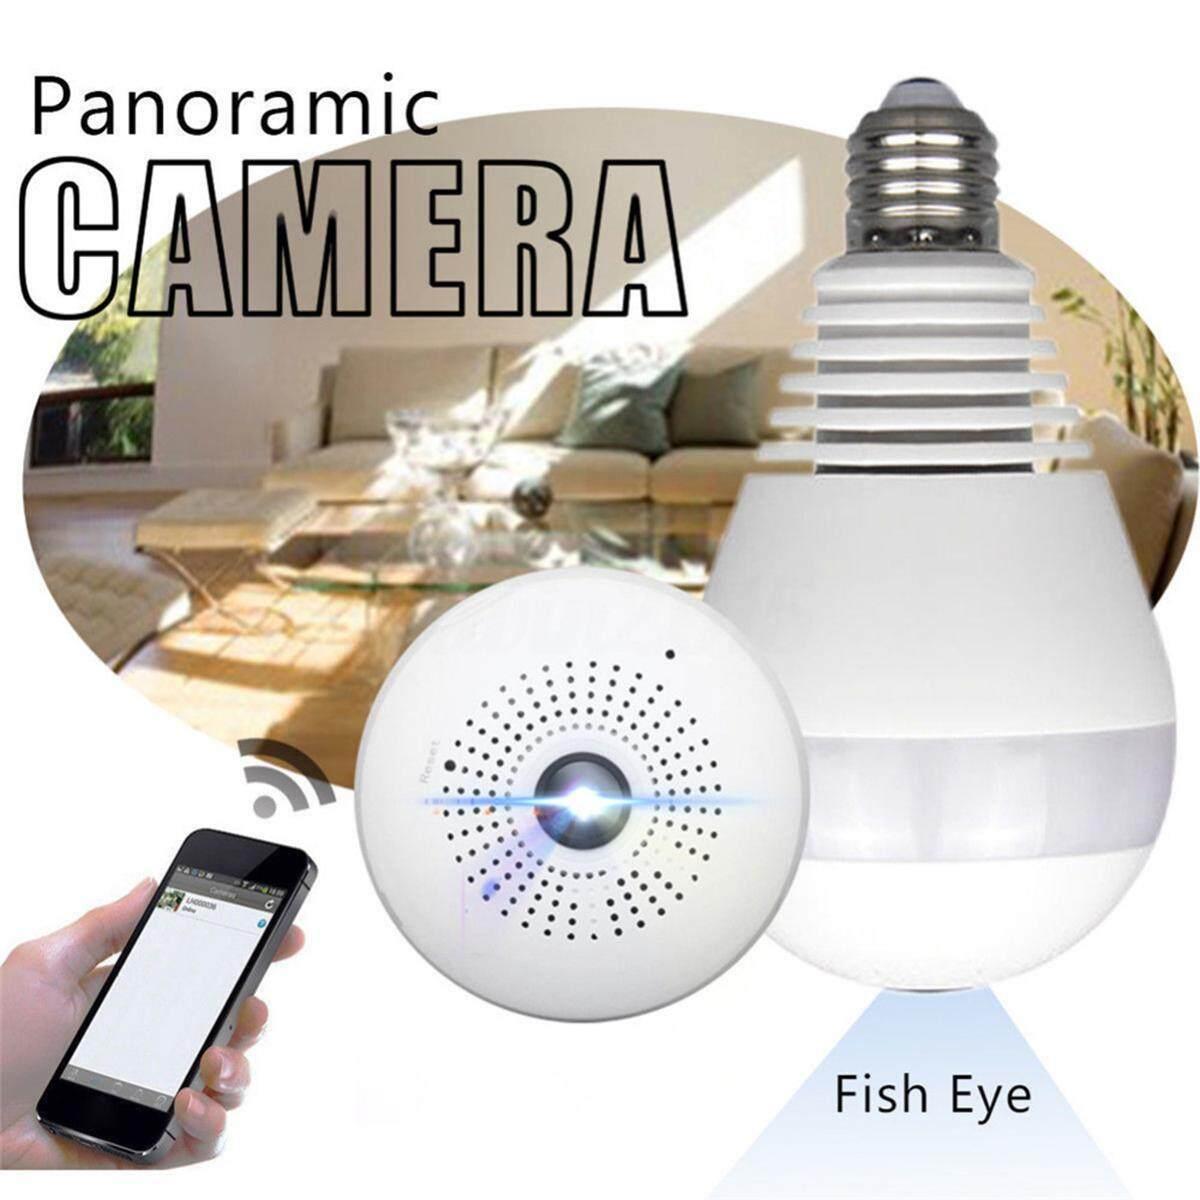 Treeone 960P WiFi Camera Bulb - HD Wireless IP Camera Night Vision VR Panoramic Fisheye Indoor